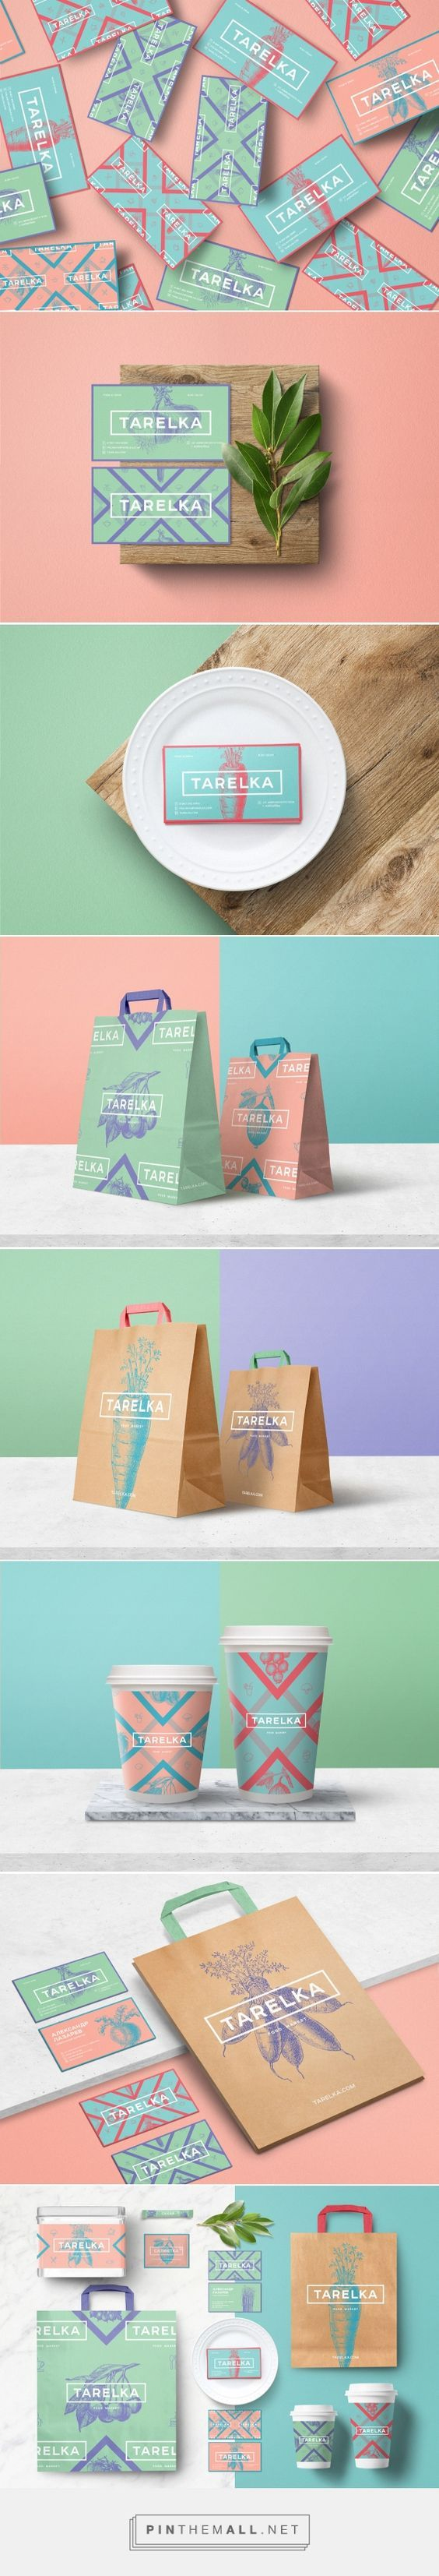 Tarelka Food Market Branding by Bureau Bumblebee | Logo Designer Bradenton, Web Design Sarasota, Tampa Fivestar Branding Agency